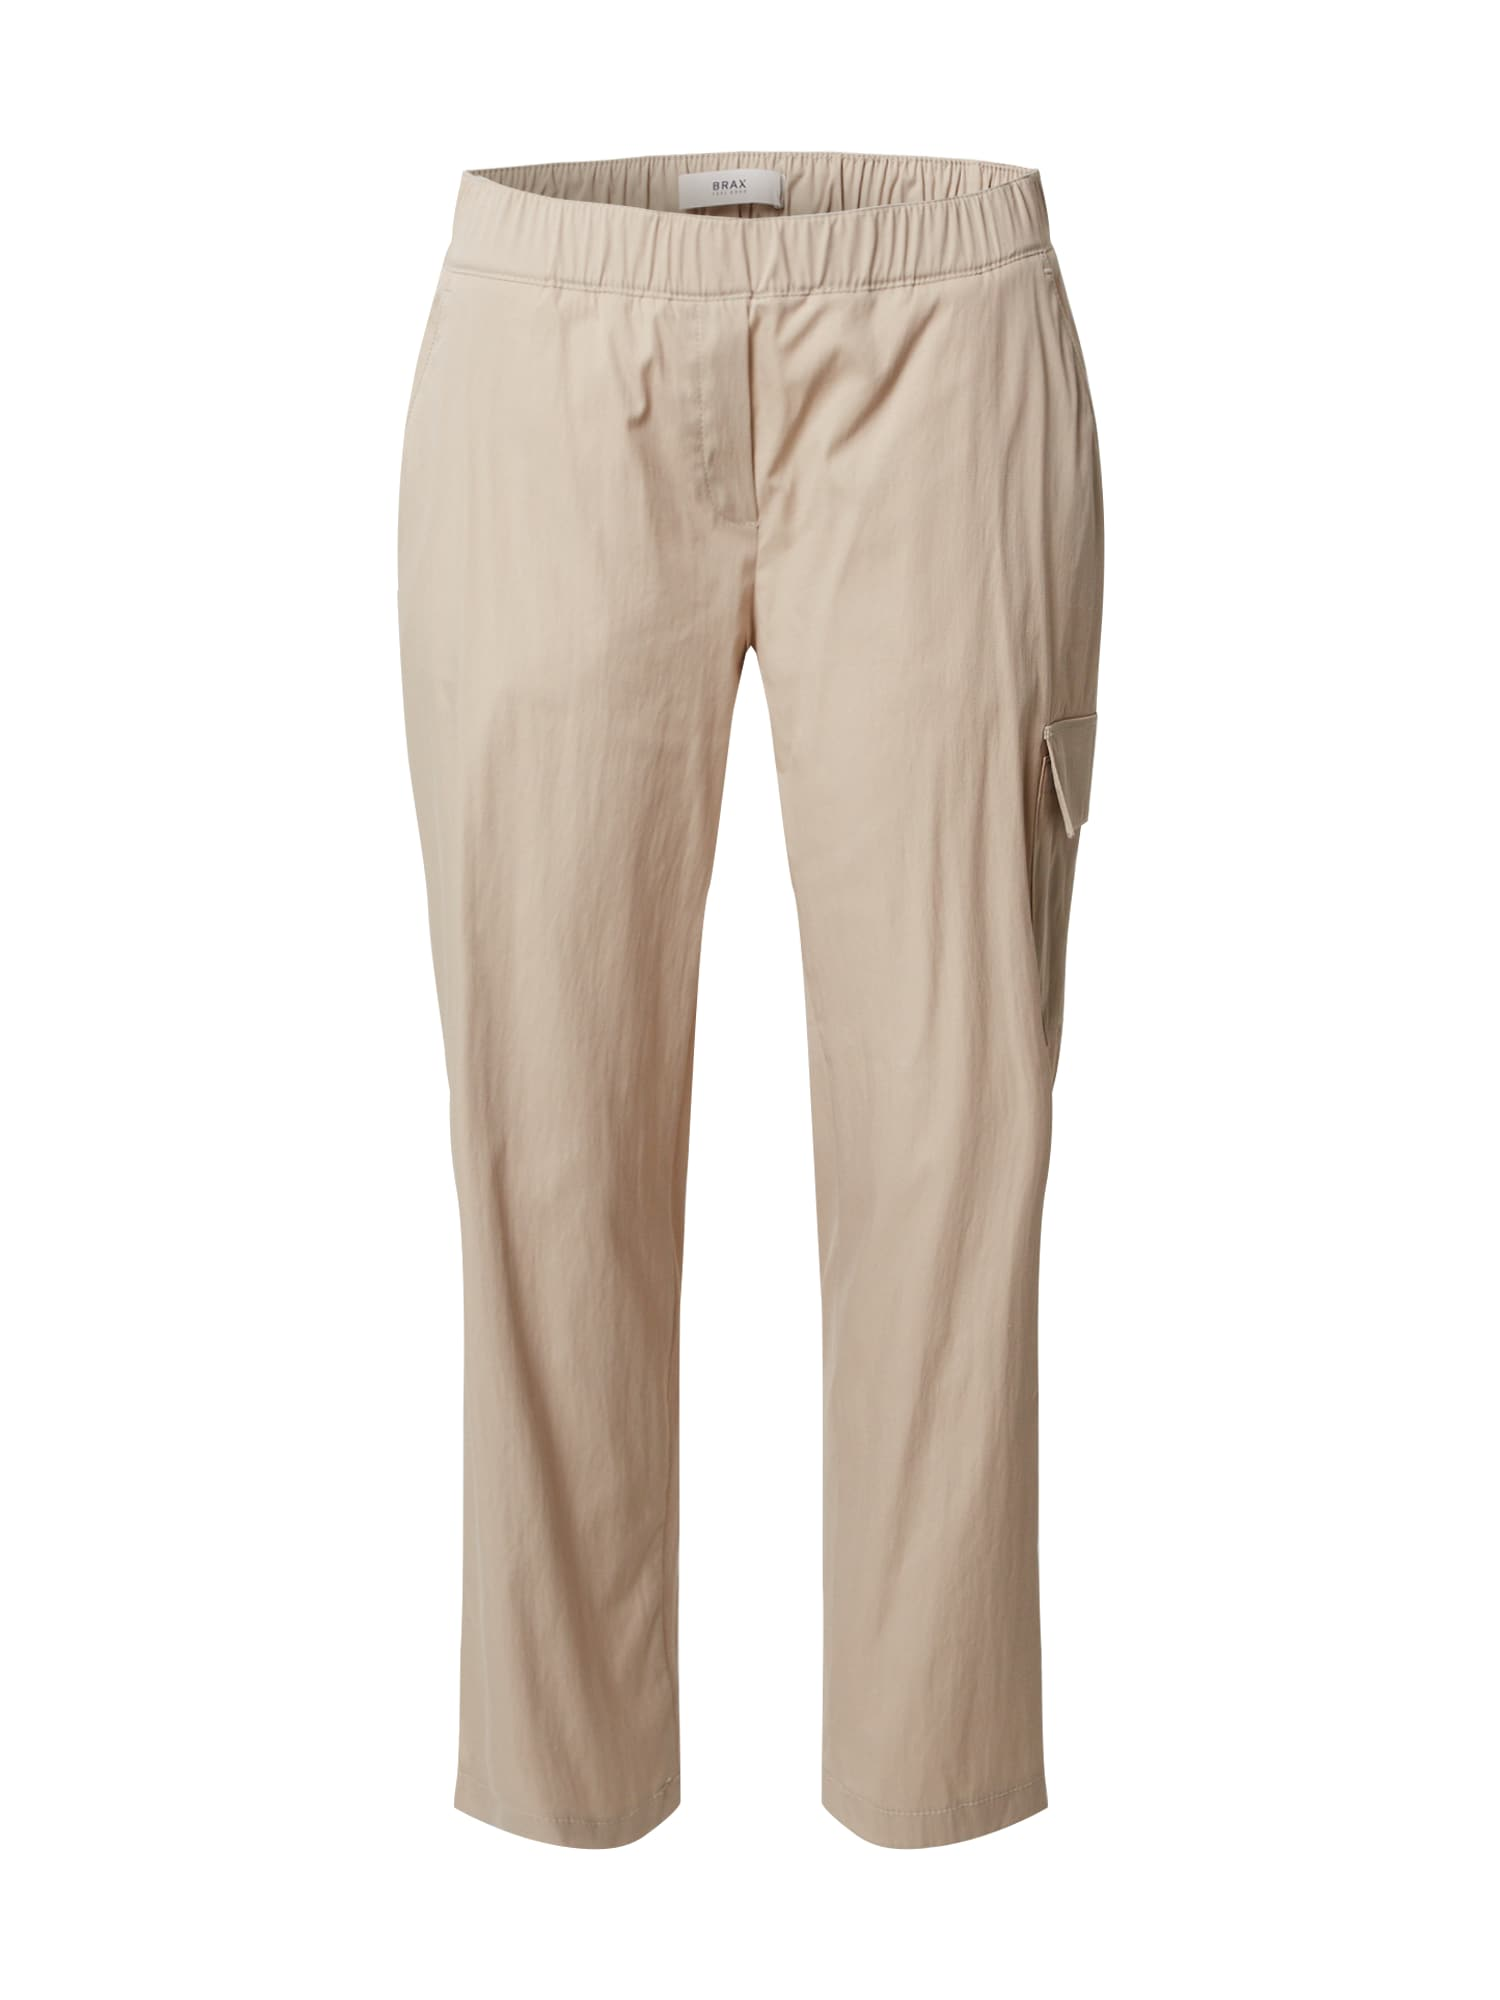 BRAX Laisvo stiliaus kelnės